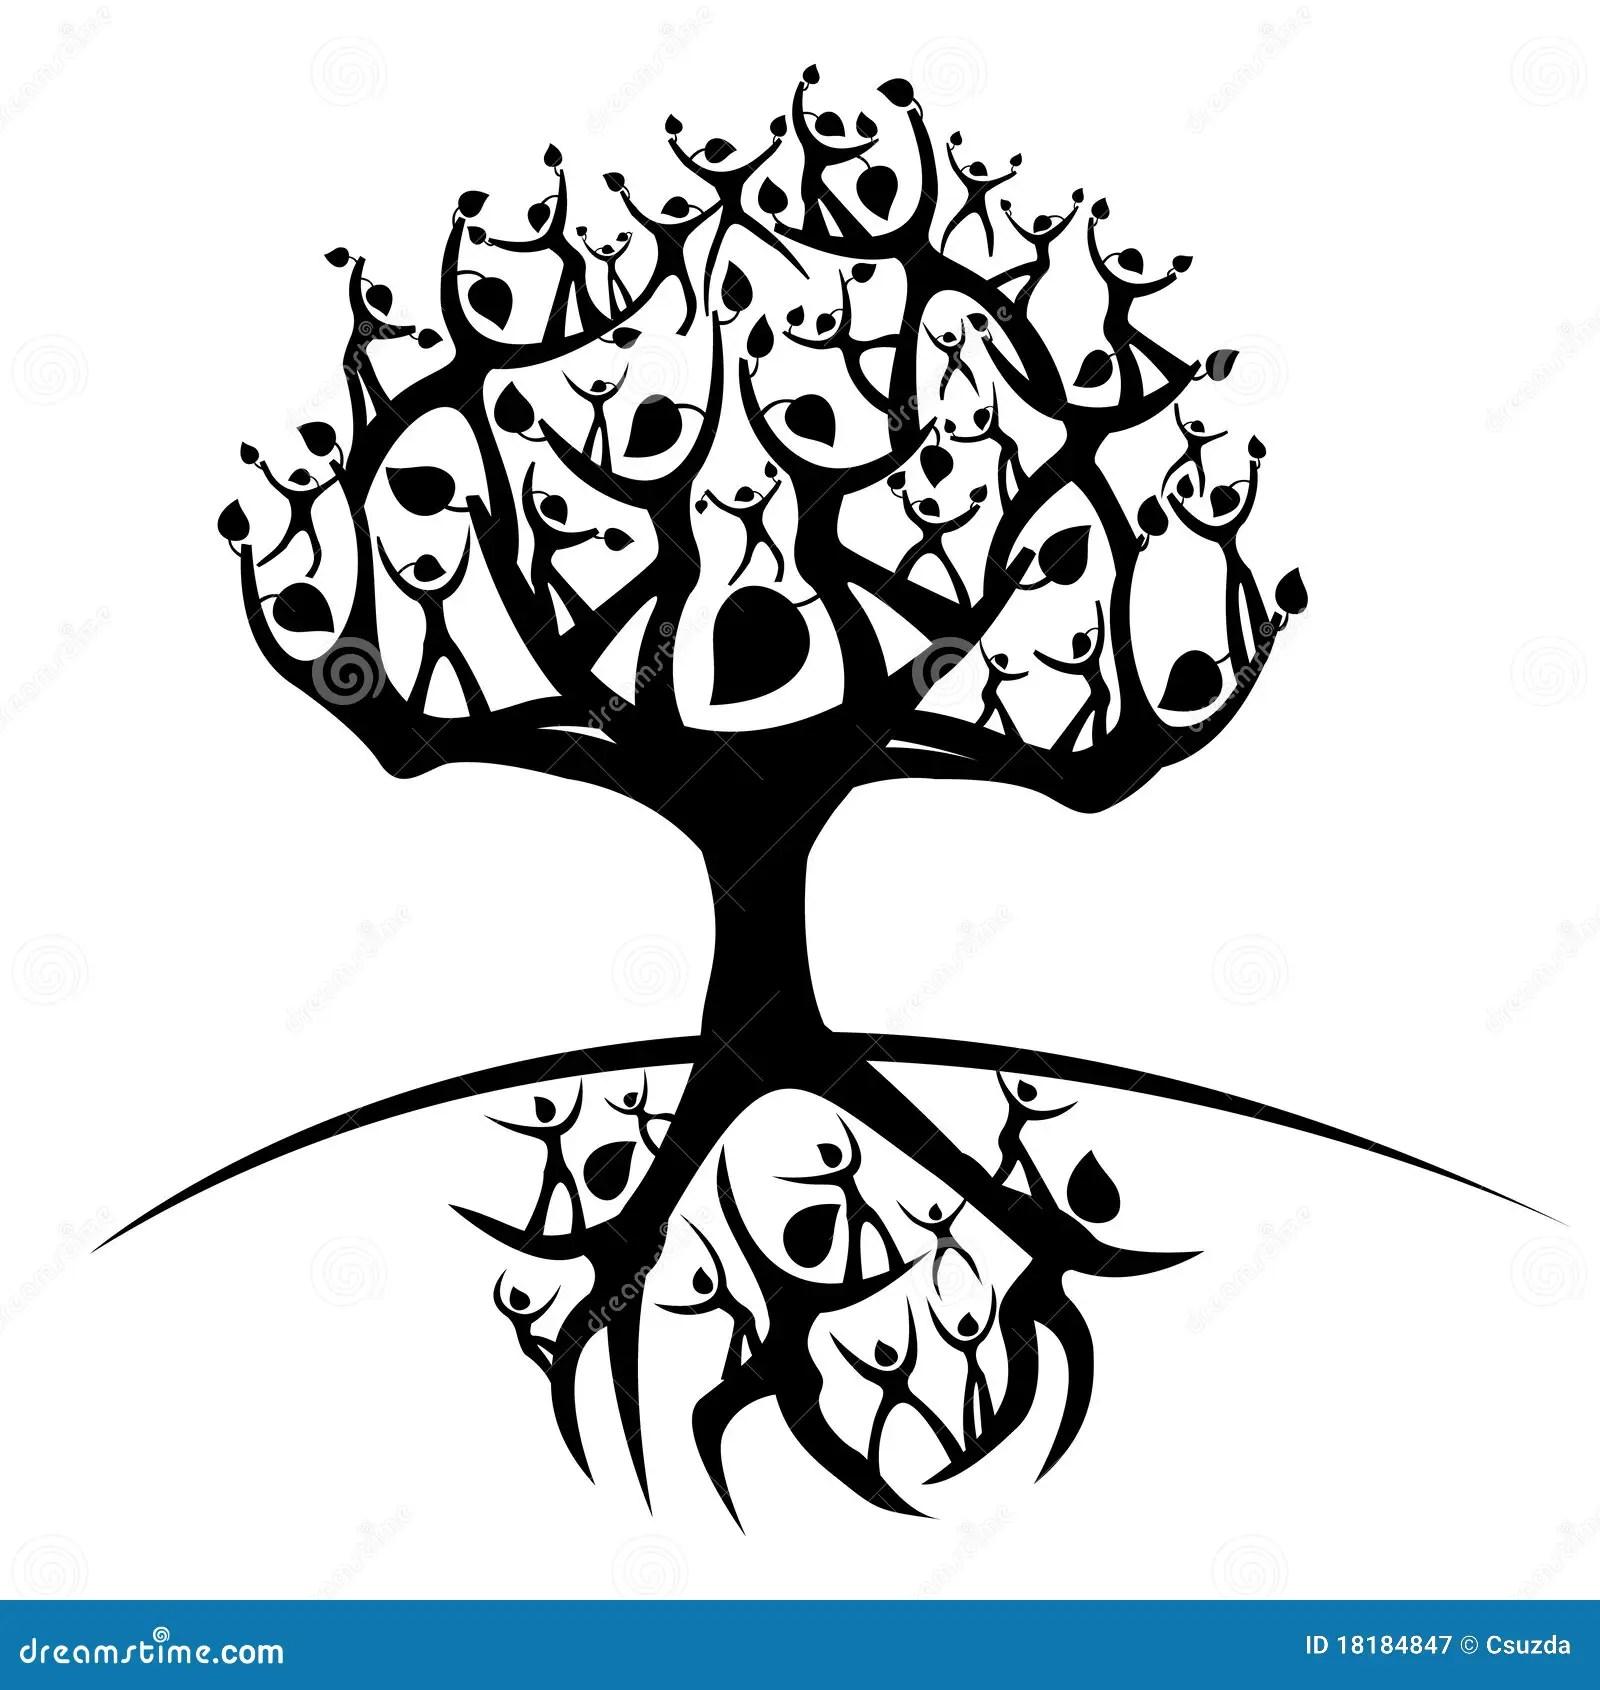 Tree of life stock vector. Illustration of symbol, grow